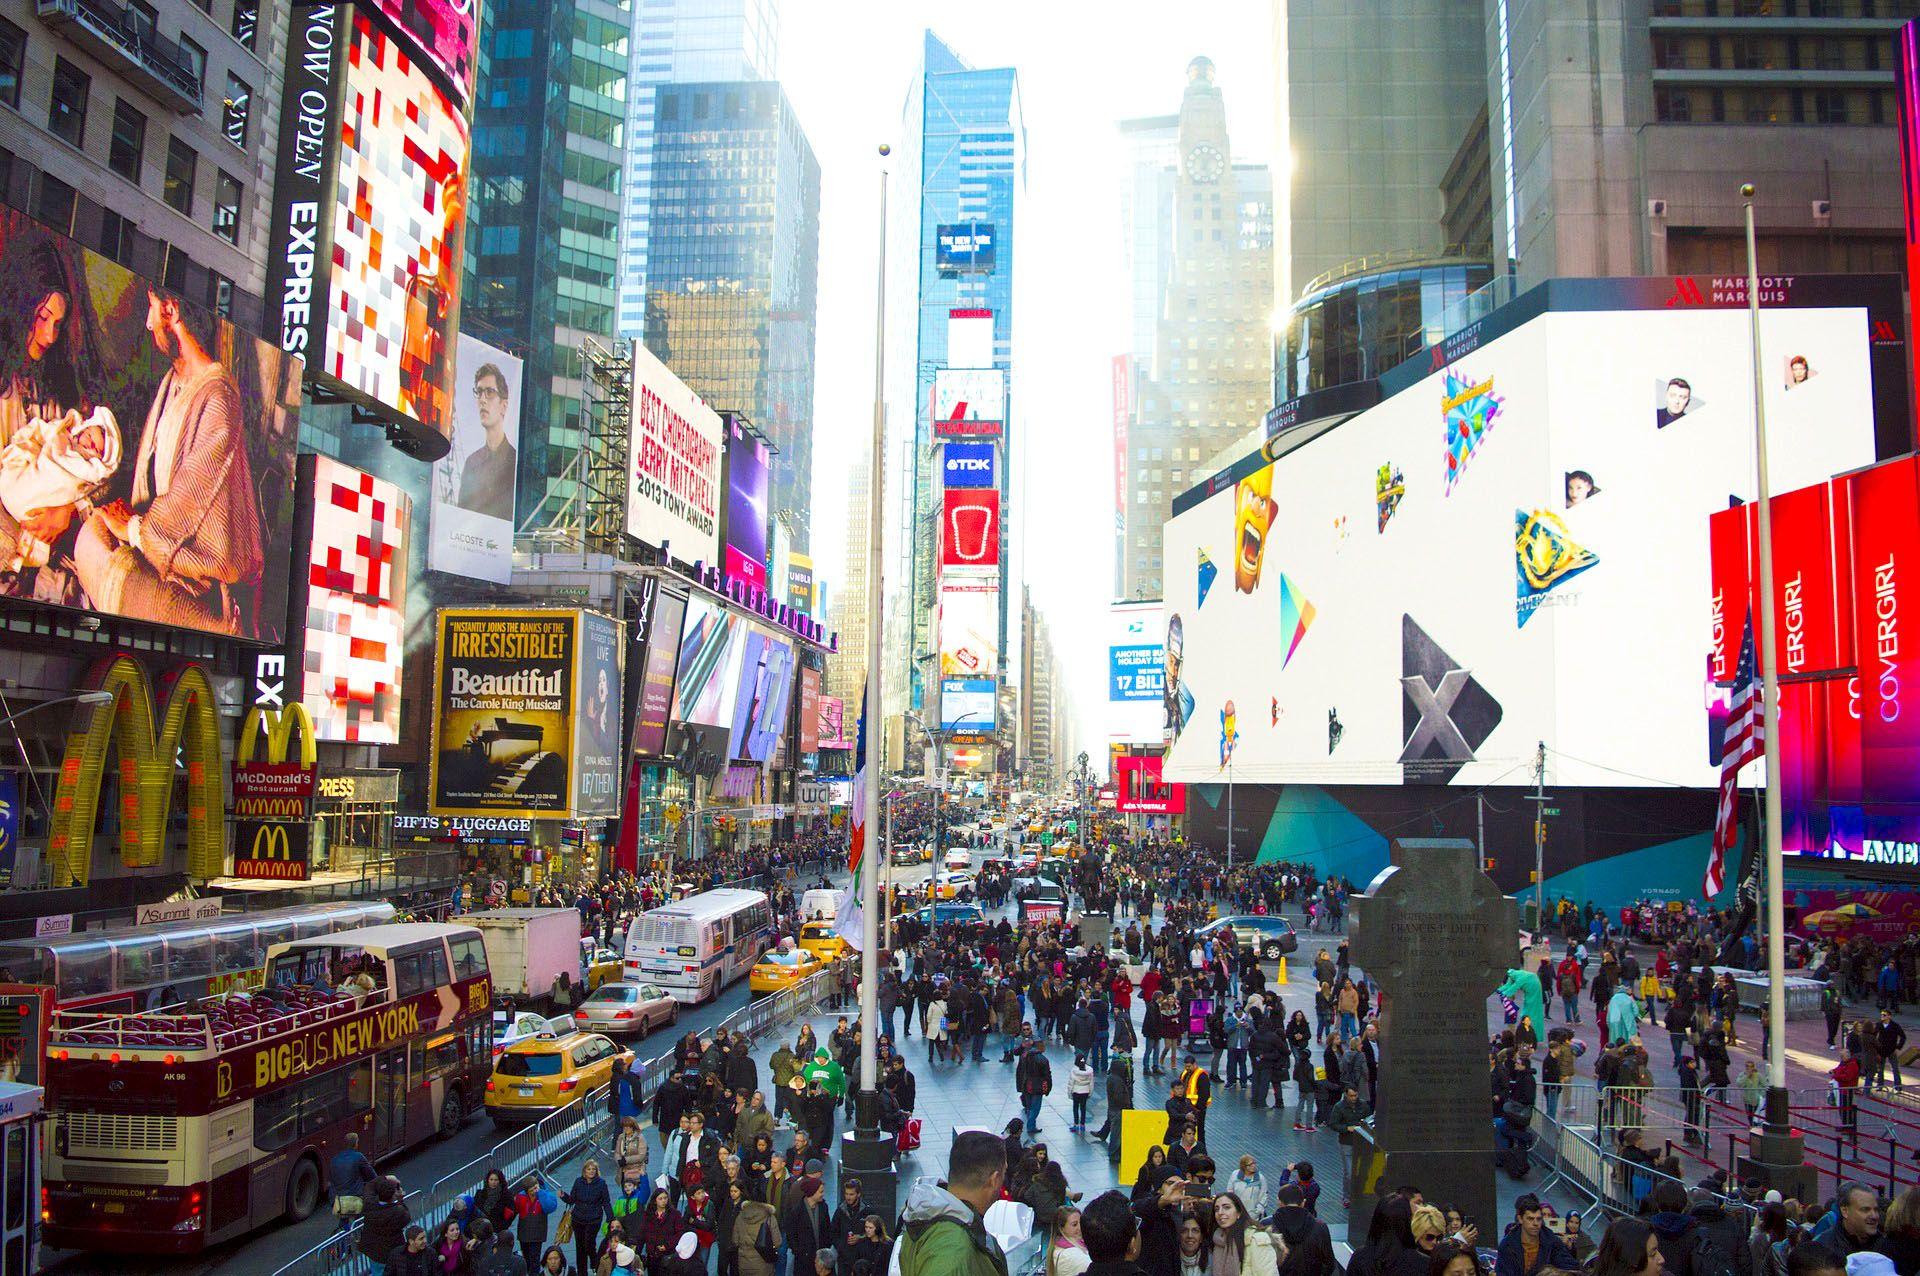 Times Square #USA #Travel #Resa #Resmål #New #York #NewYork #CIty #NYC #NewYorkCity #Times #Square #TimesSquare